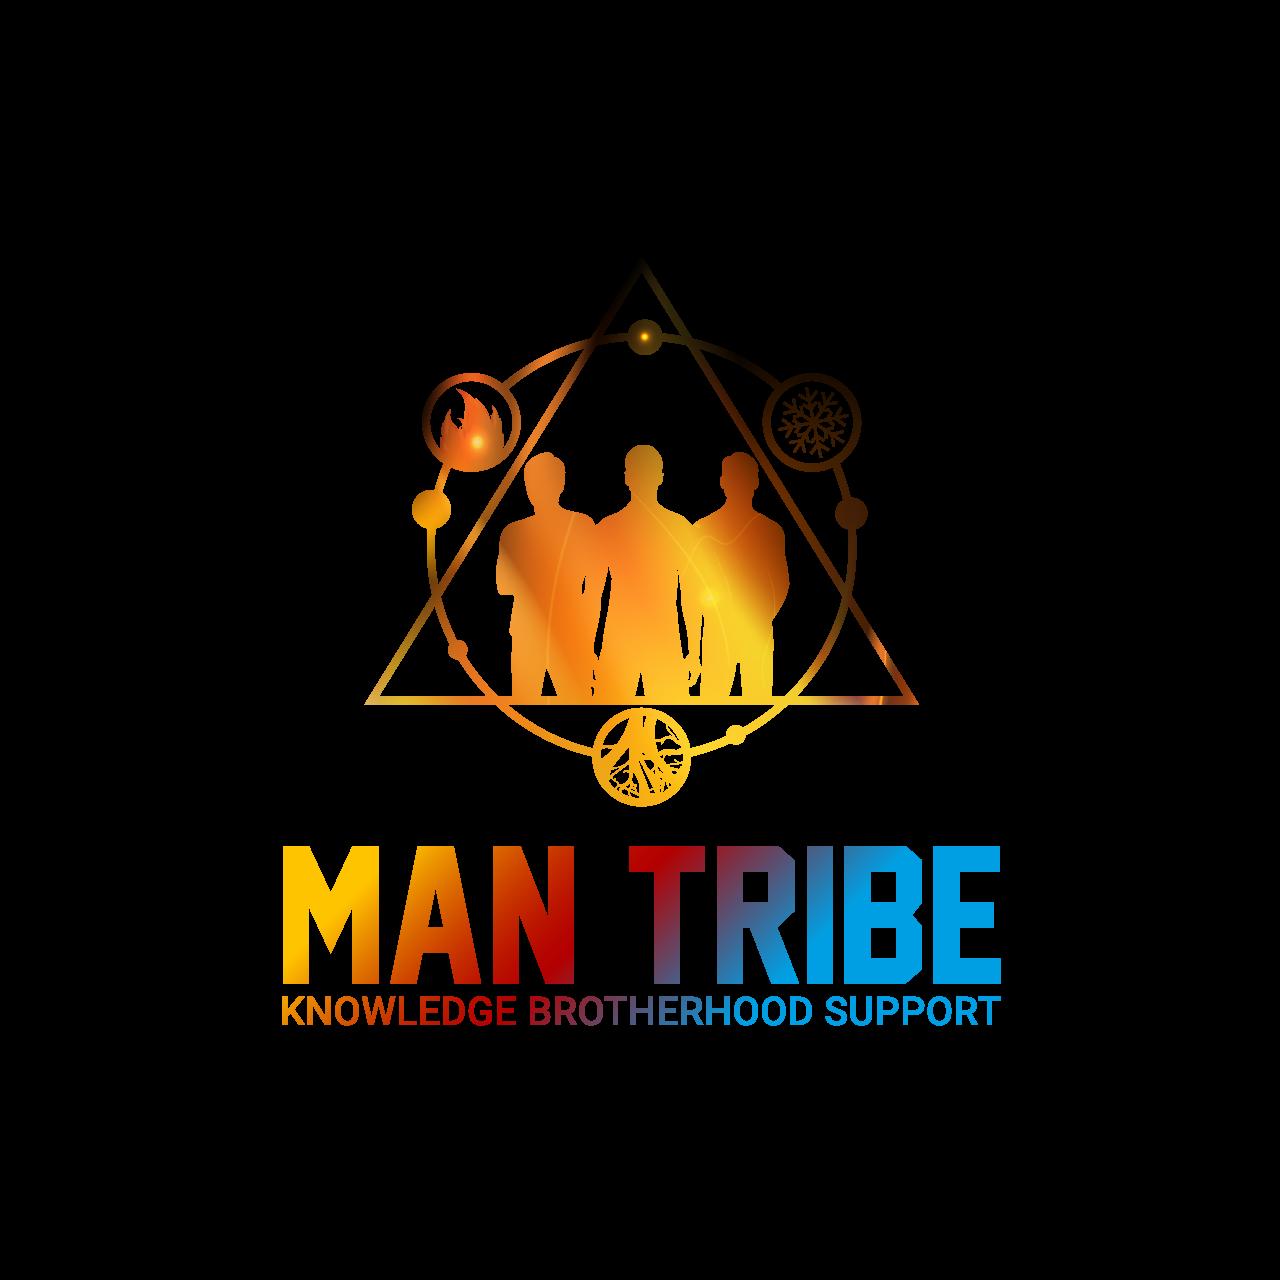 THE BROTHERHOOD OF MAN-  KNOWLEDGE BROTHERHOOD SUPPORT